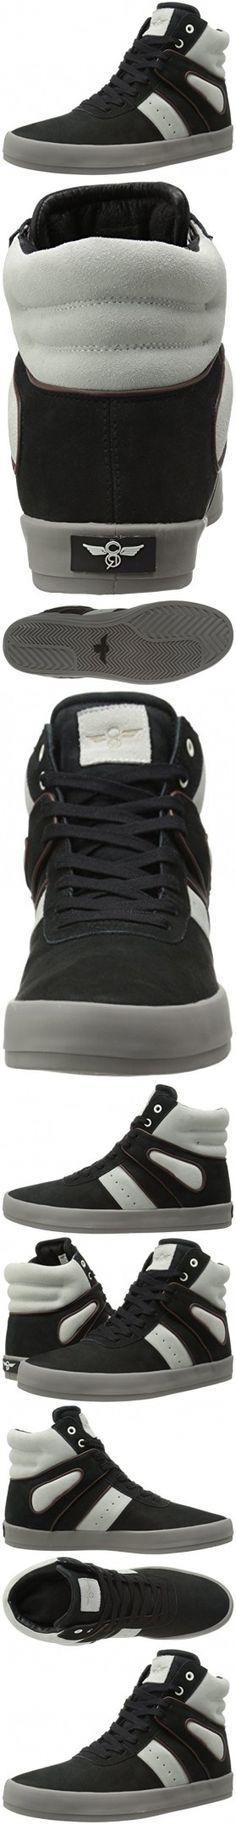 Creative Recreation Men's Moretti Fashion Sneaker, Black Marshmallow, 8.5 M US